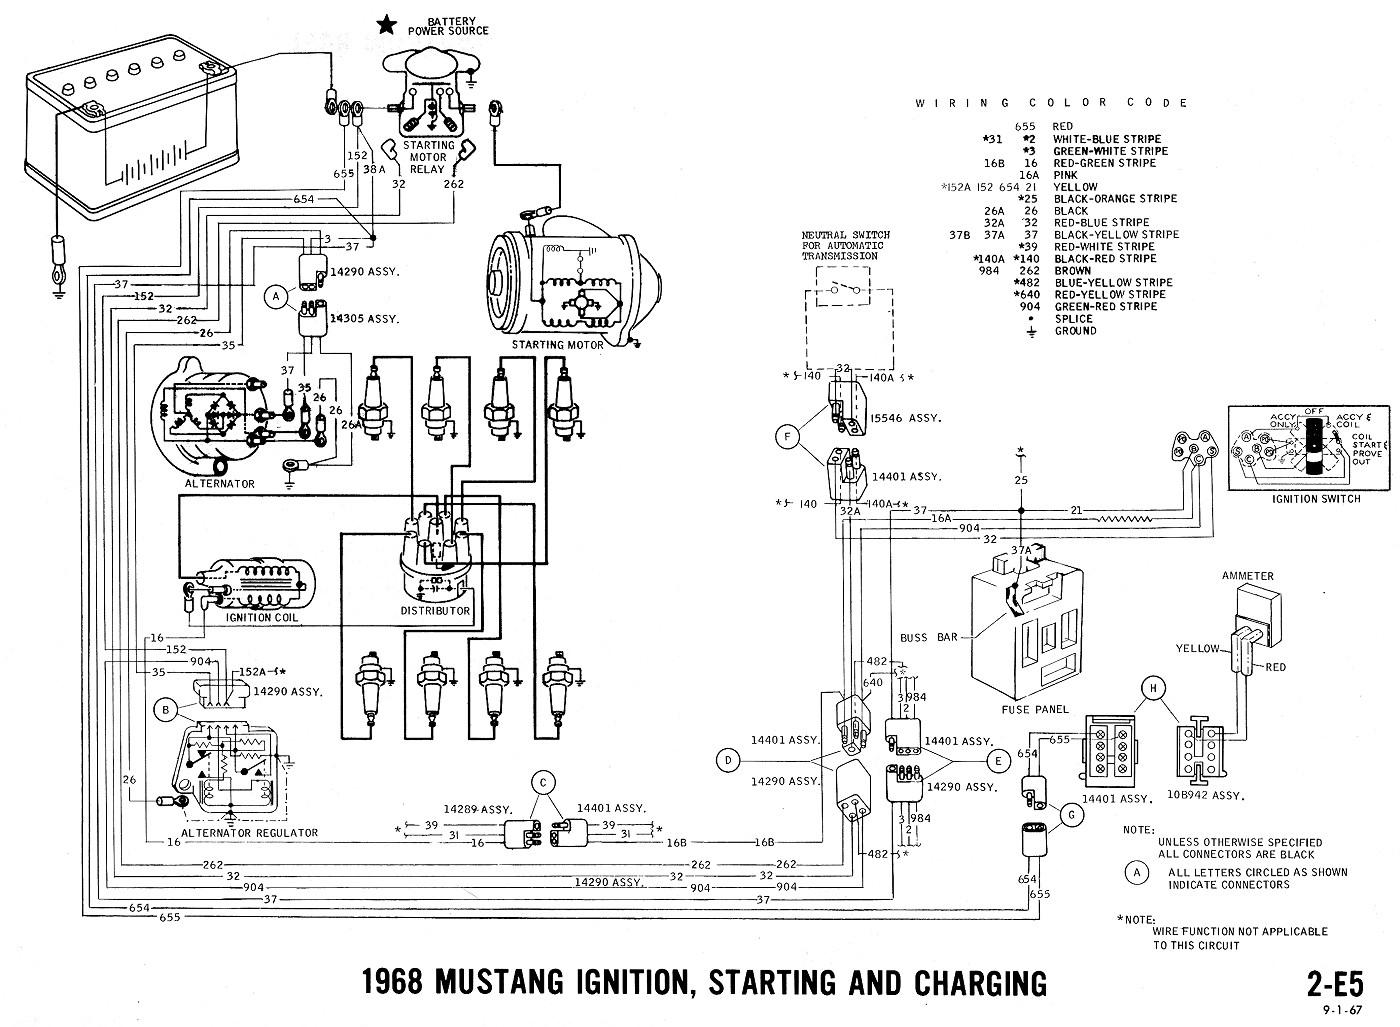 1968 mustang wiring diagrams evolving software 06 mustang wiring diagram master wiring diagram 68 mustang fuse diagrams #12